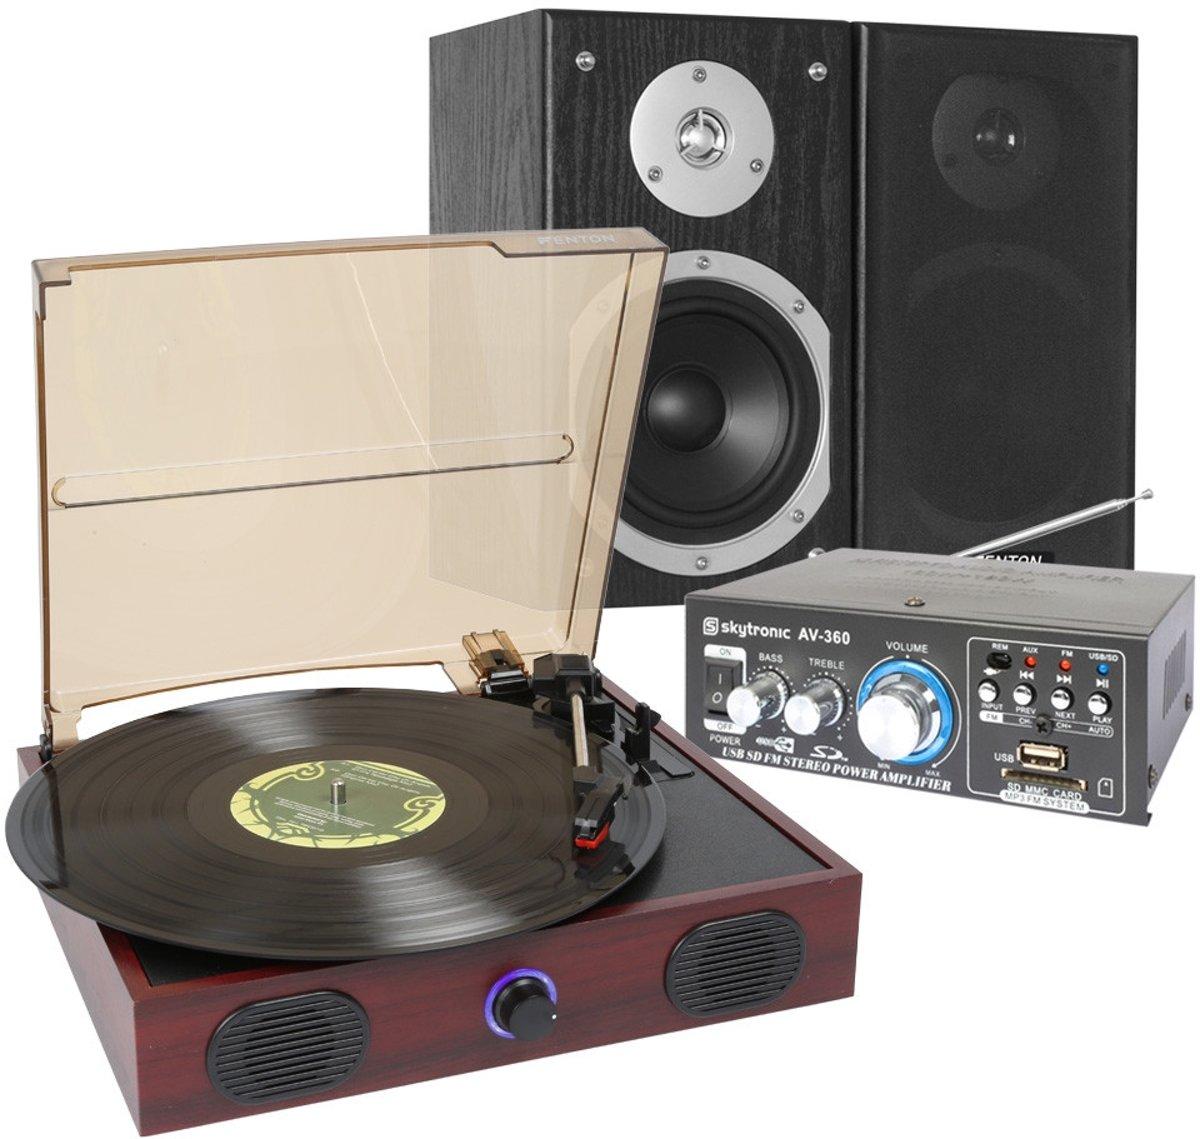 Platenspeler stereo set - Complete set met platenspeler, USB / SD speler, versterker, spea